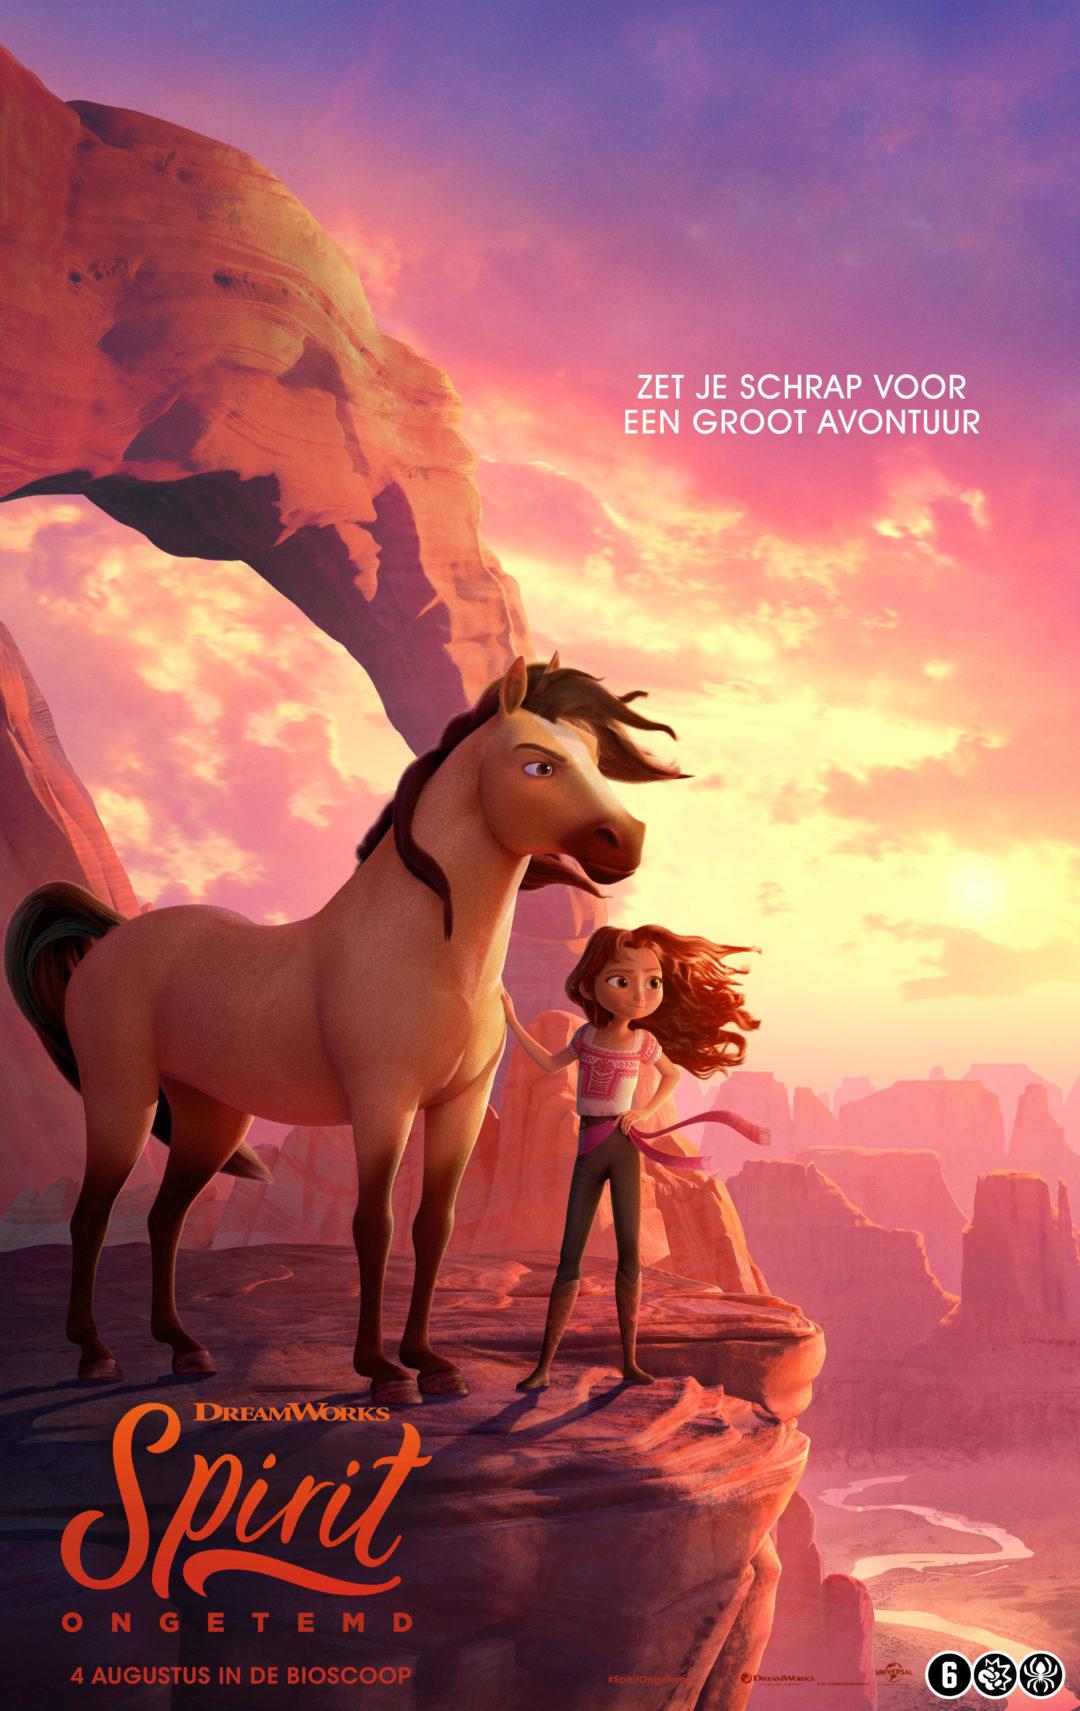 Spirit-Ongetemd_ps_1_jpg_sd-high_Copyright-2021-DreamWorks-Animation-LLC-All-Rights-Reserved.jpg